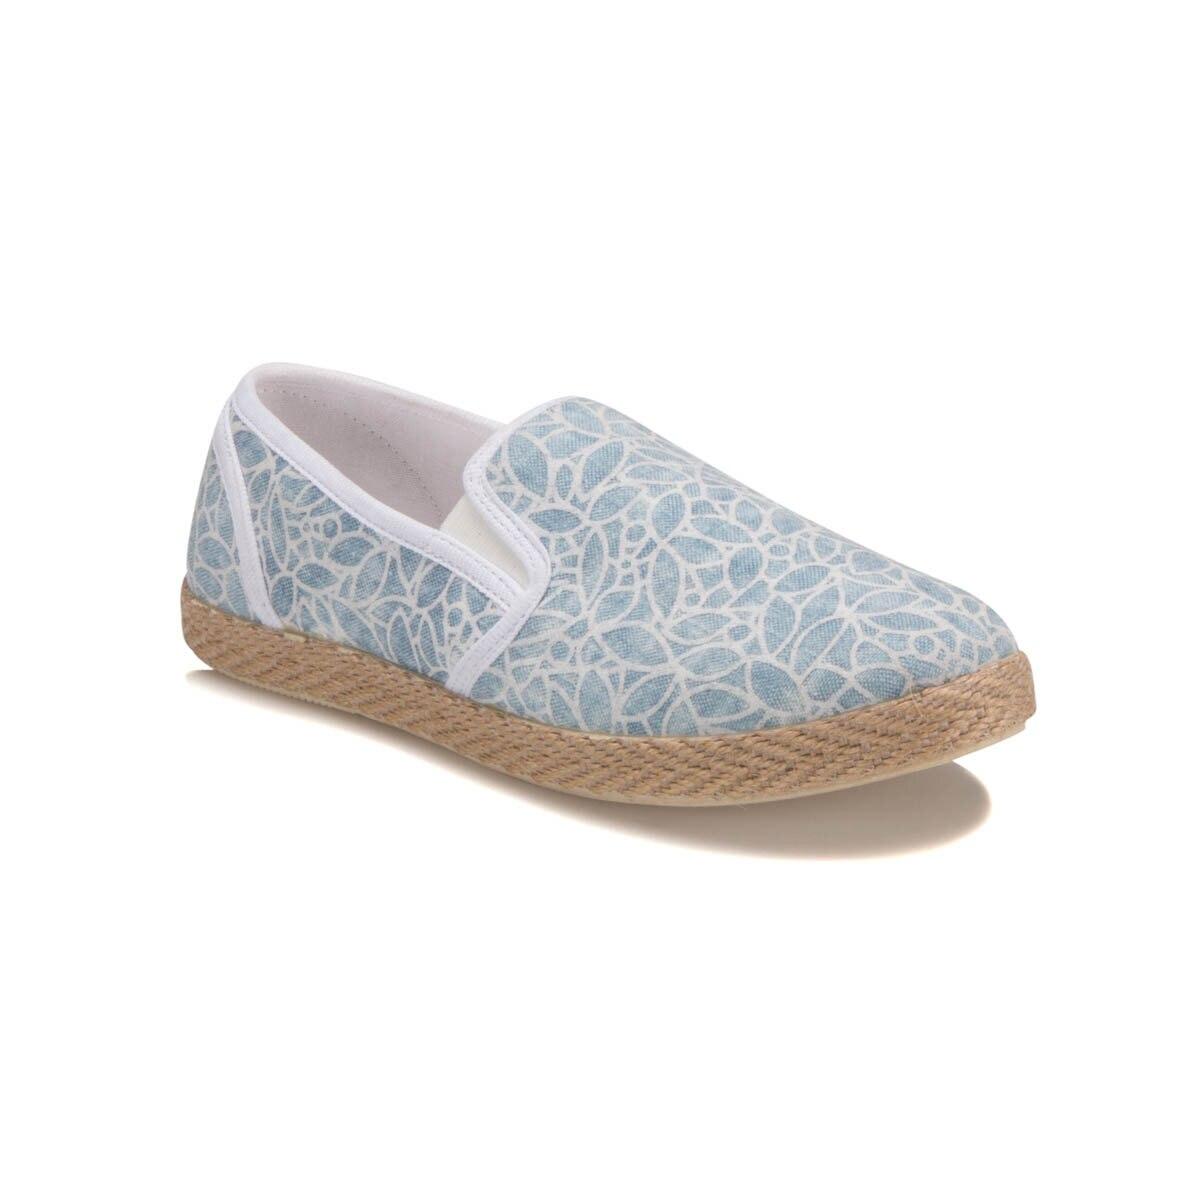 FLO U2803 Light Blue Women 'S Slip On Shoes Carmens